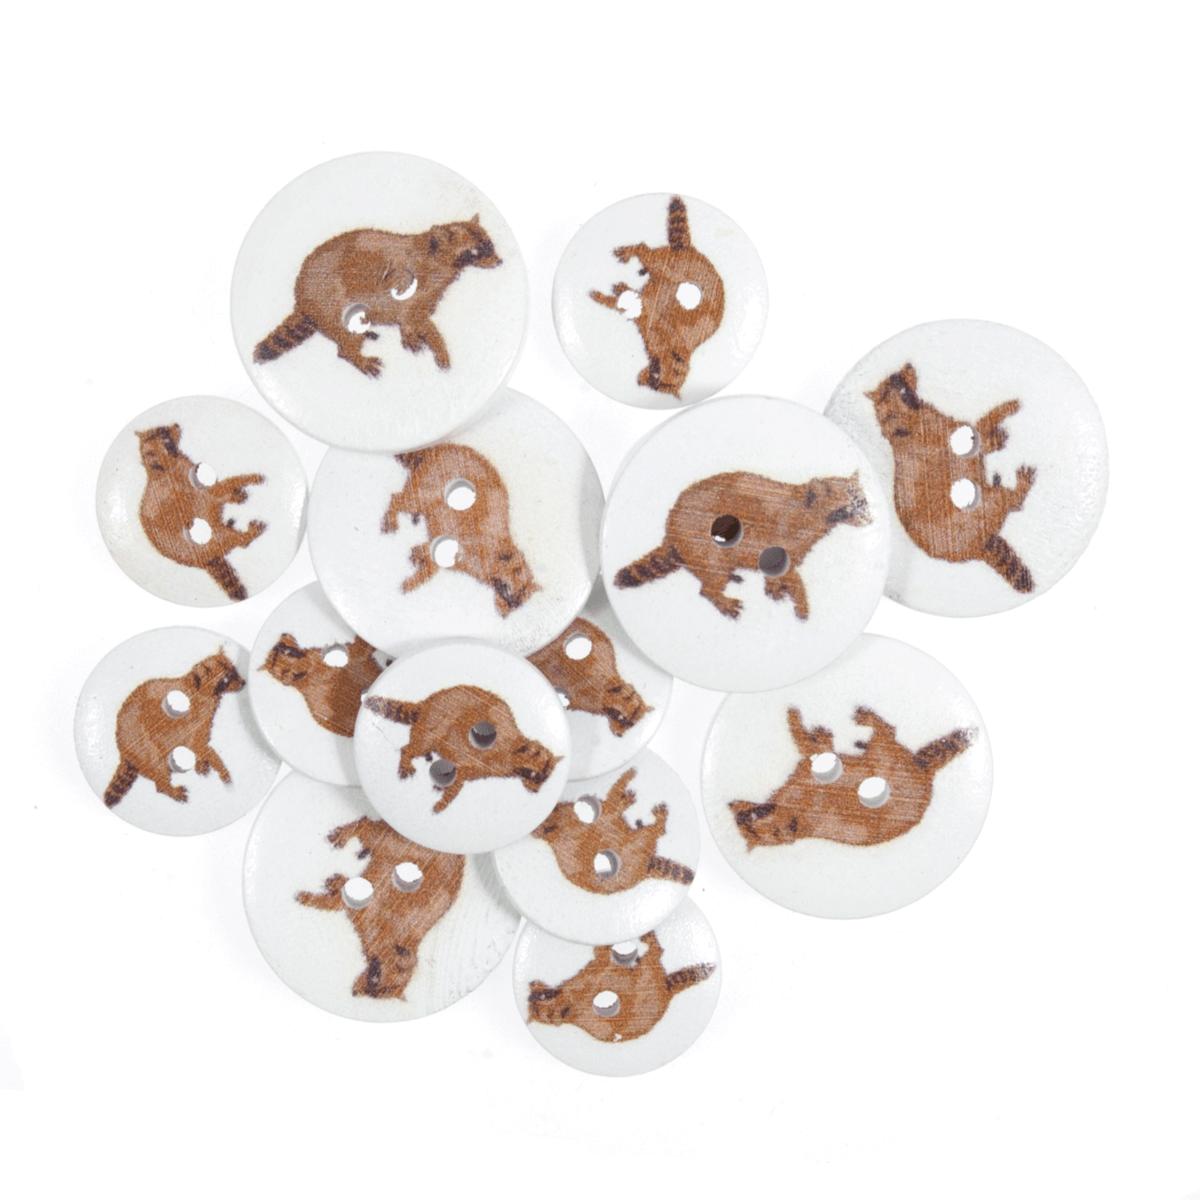 15 x Assorted Brown Raccoon Wooden Craft Buttons 18mm - 25mm